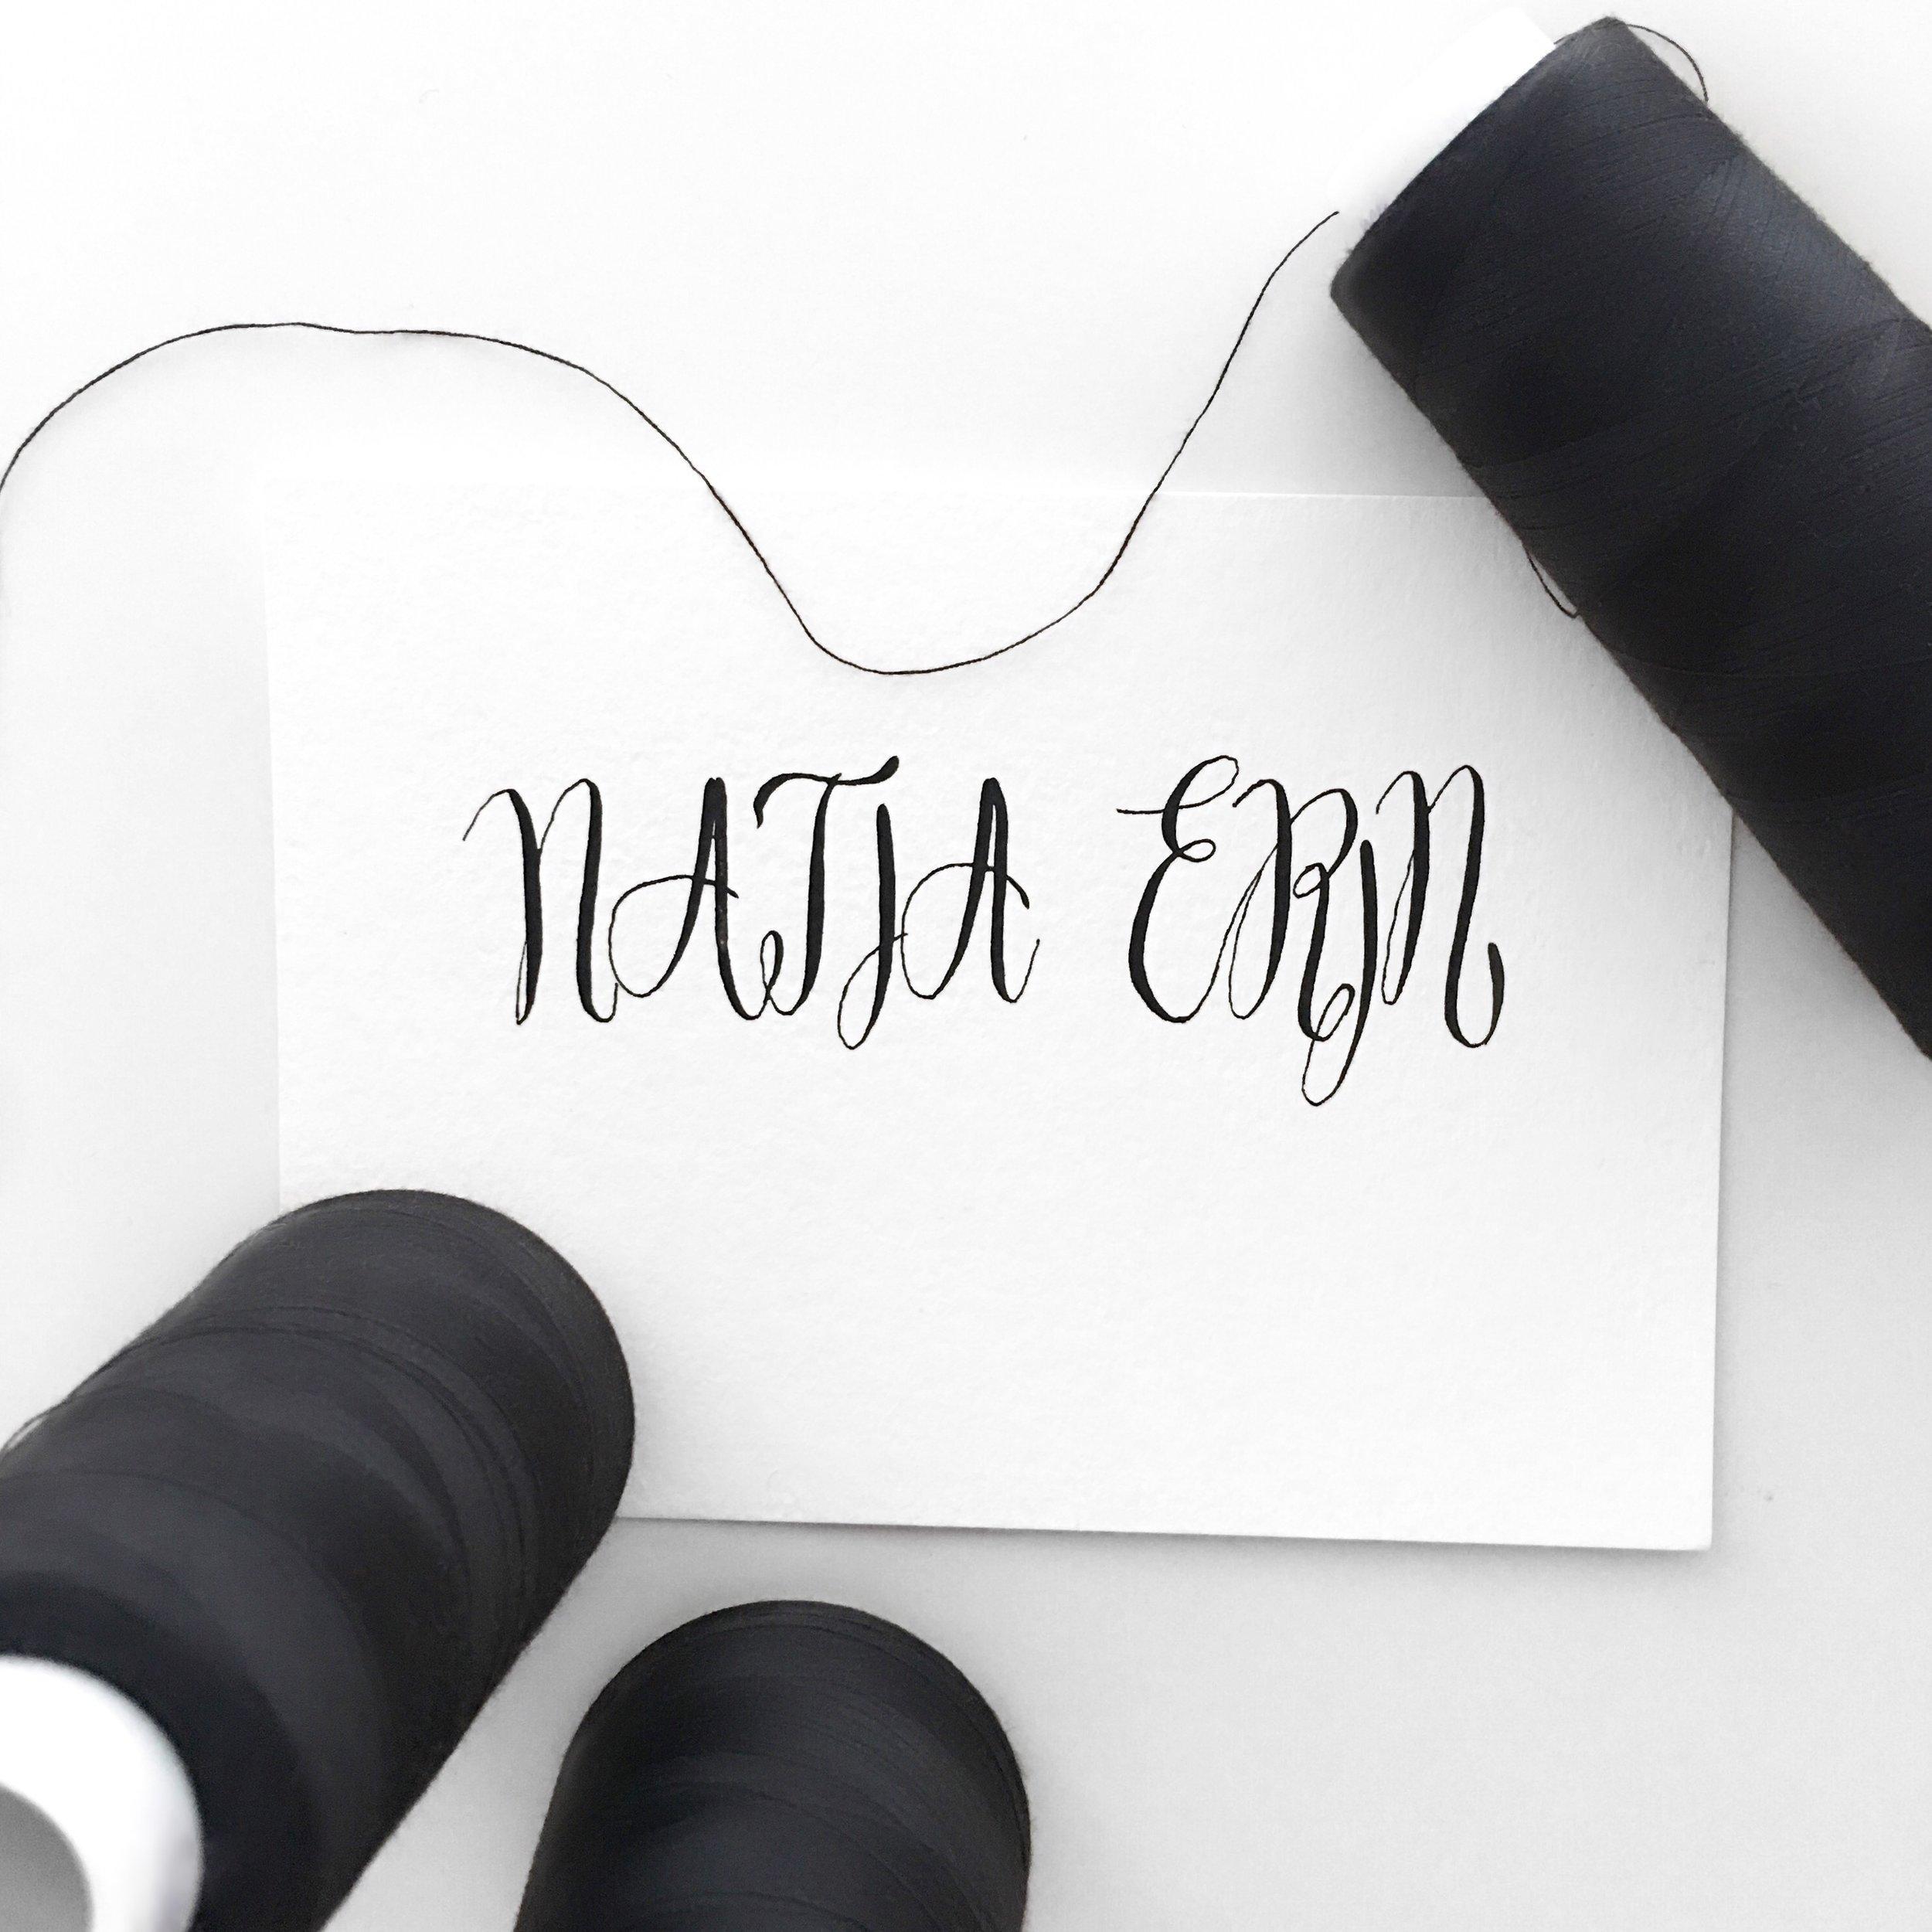 NATIA ERIN + black sewing thread